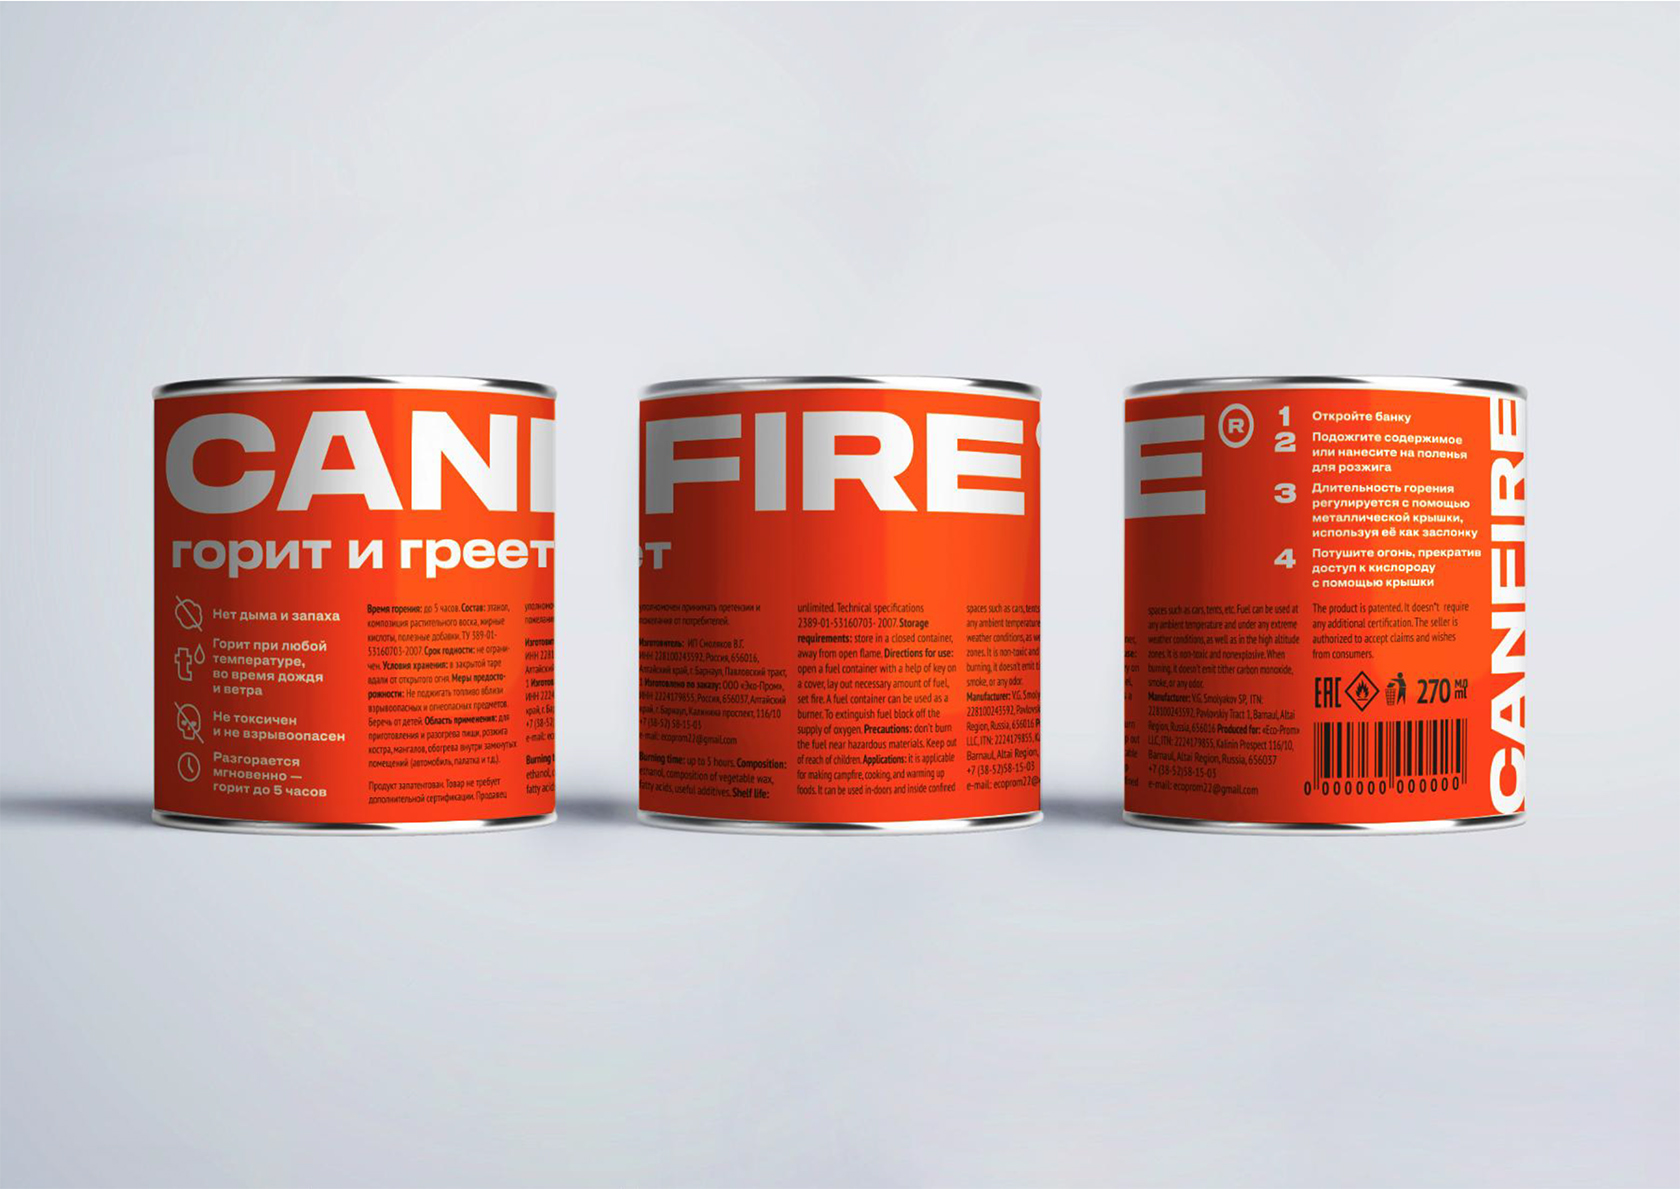 CANFIRE – Innovative Fire Source Brand